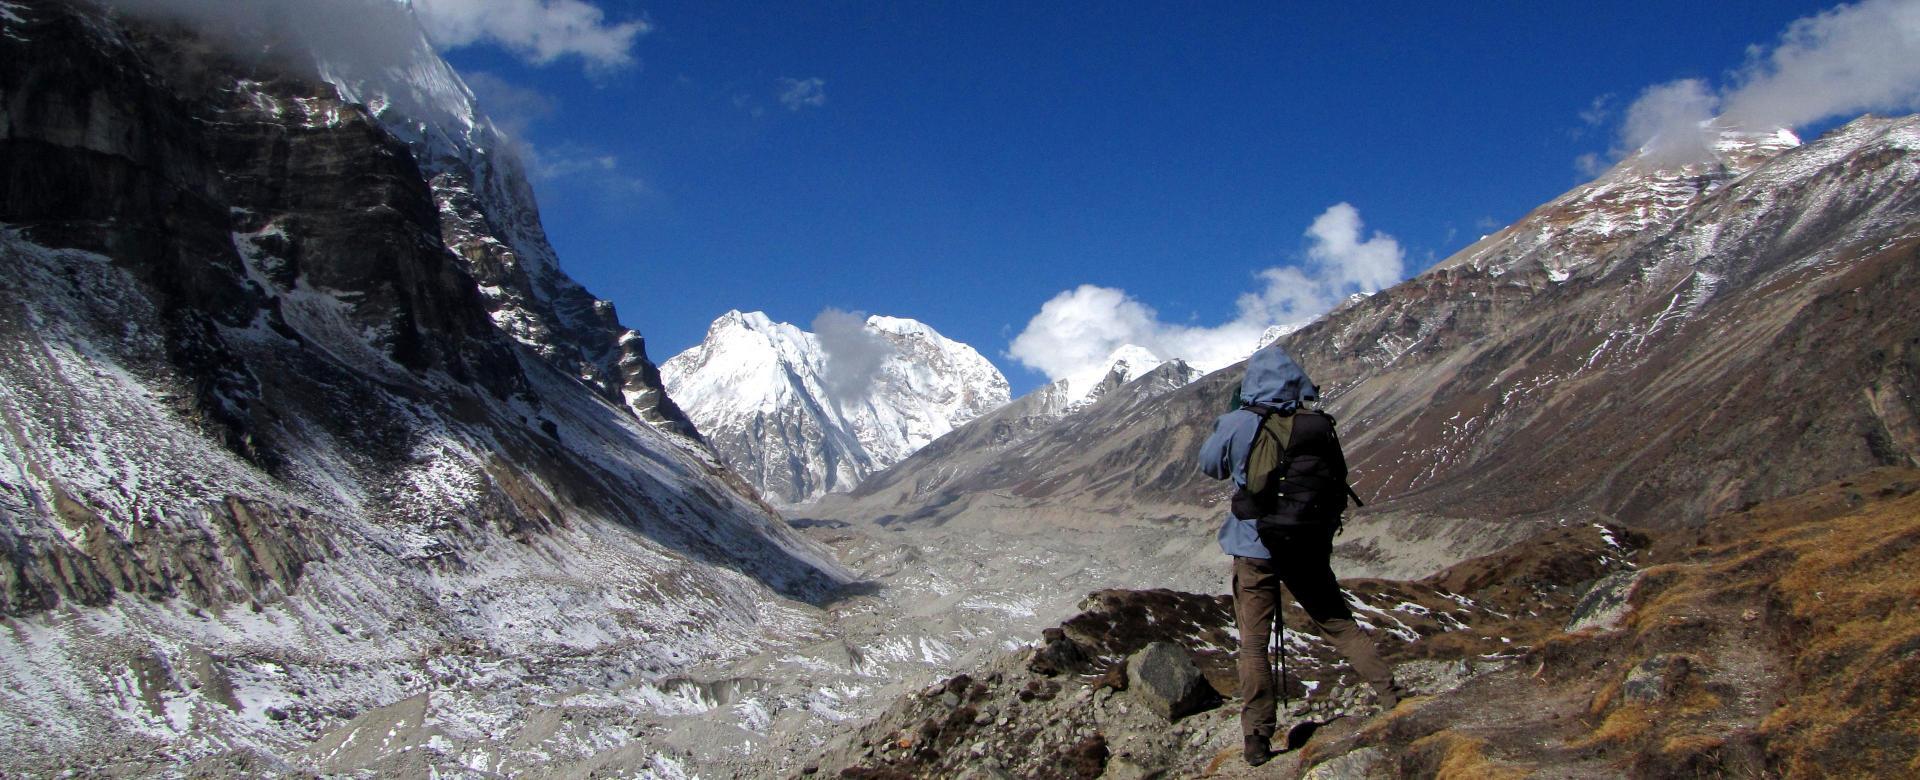 Voyage à pied Nepal : Du kangchenjunga au makalu